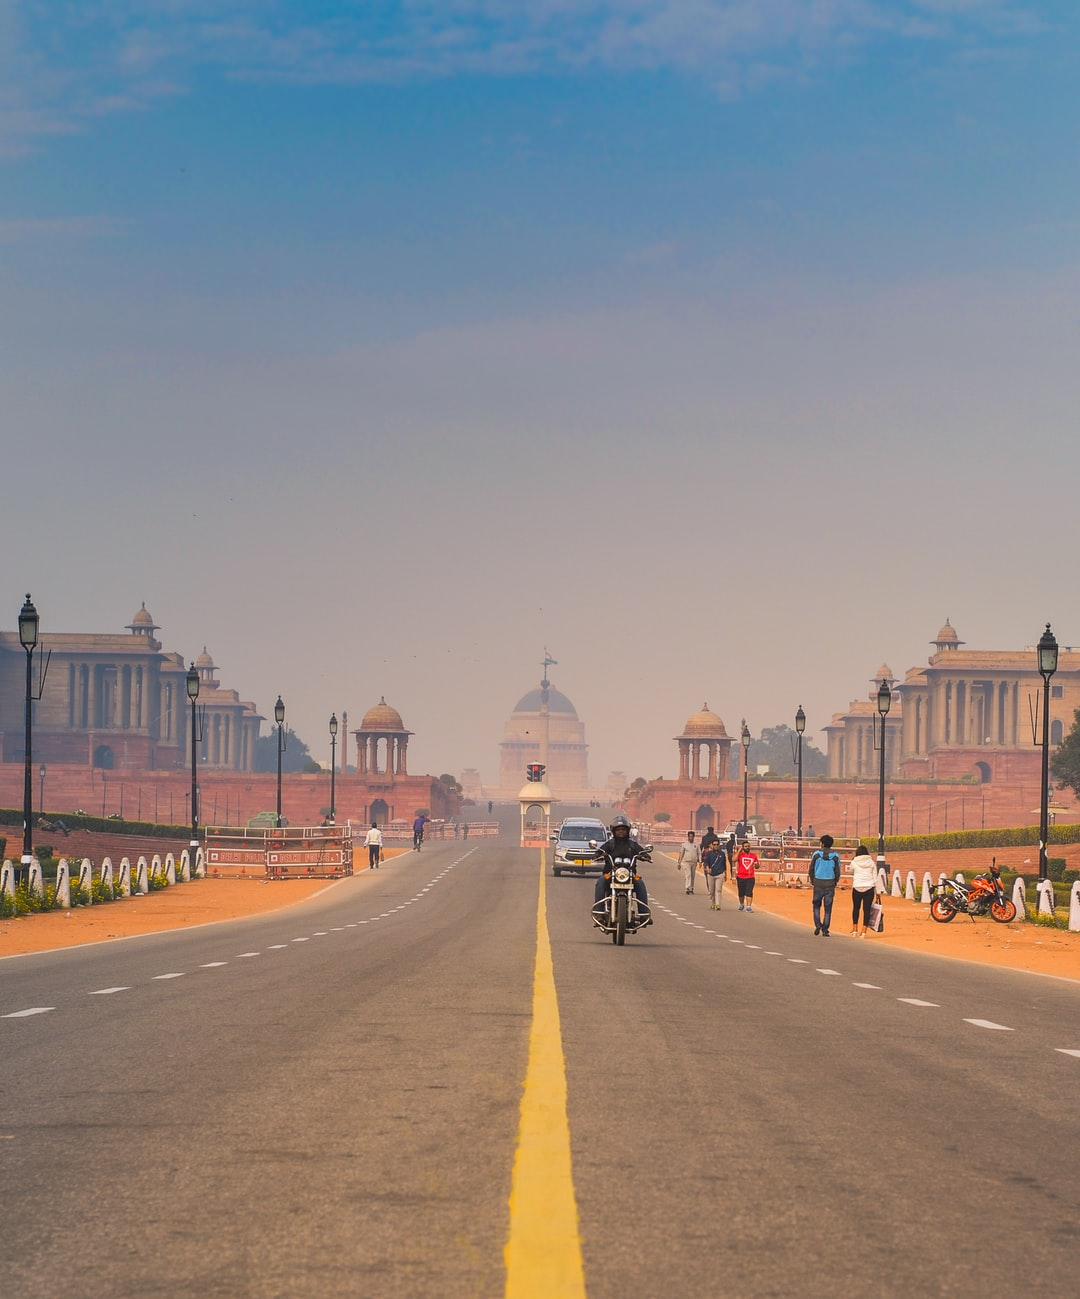 N85 Residence In New Delhi India: Rashtrapati Bhawan, New Delhi, India Pictures